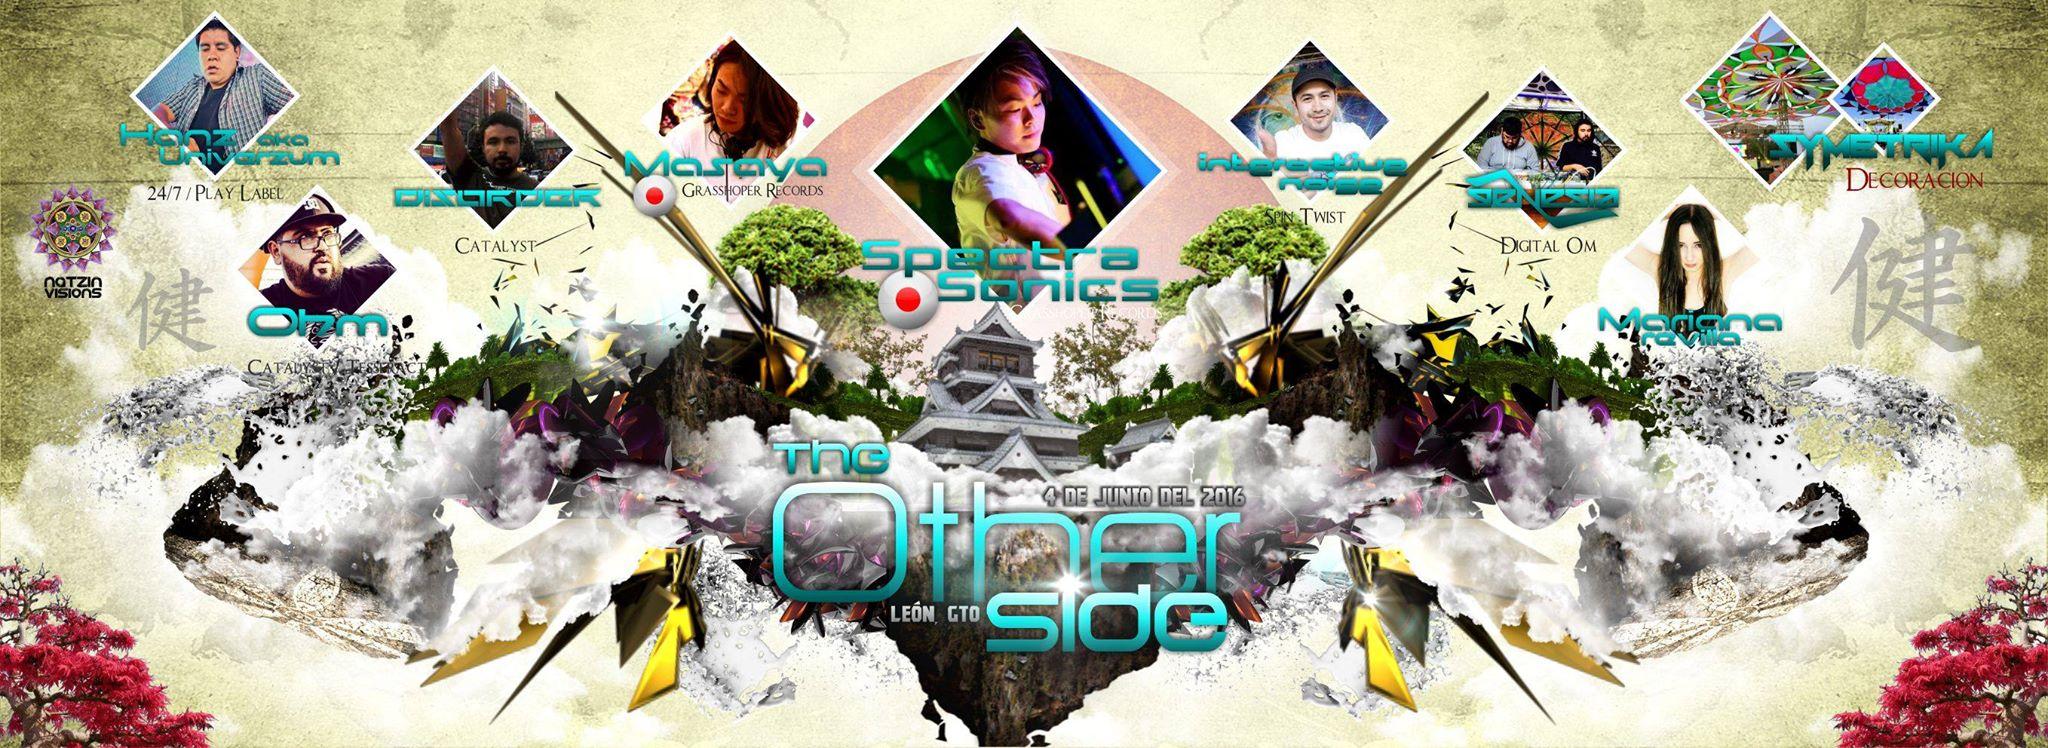 evento-the-other-side-leon-gto-4-junio